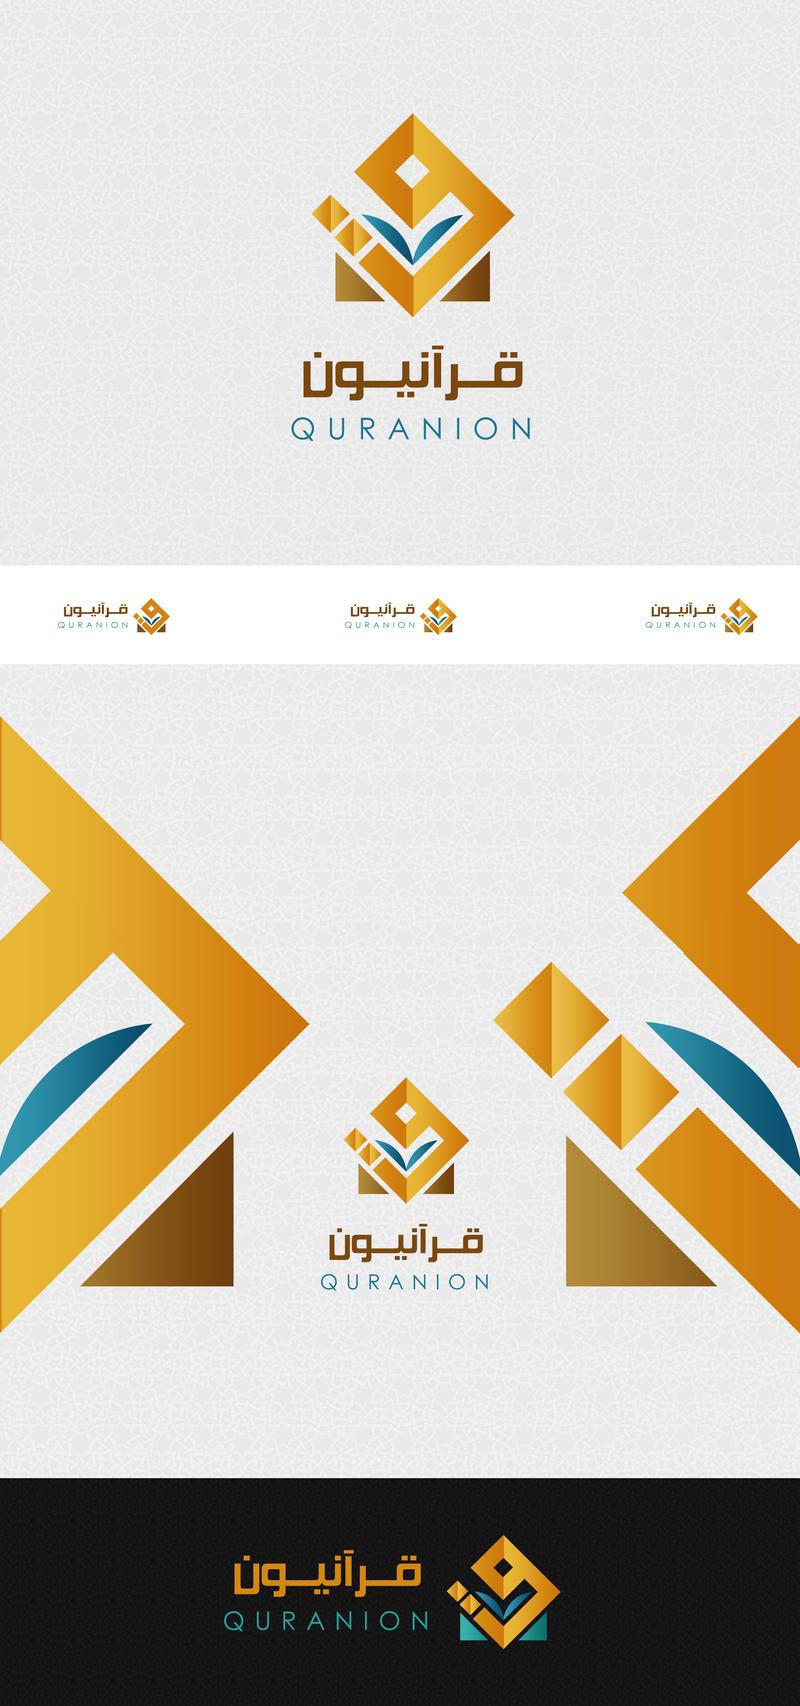 quranion islamic logo design by ahmedelzahra designs interfaces logos ...